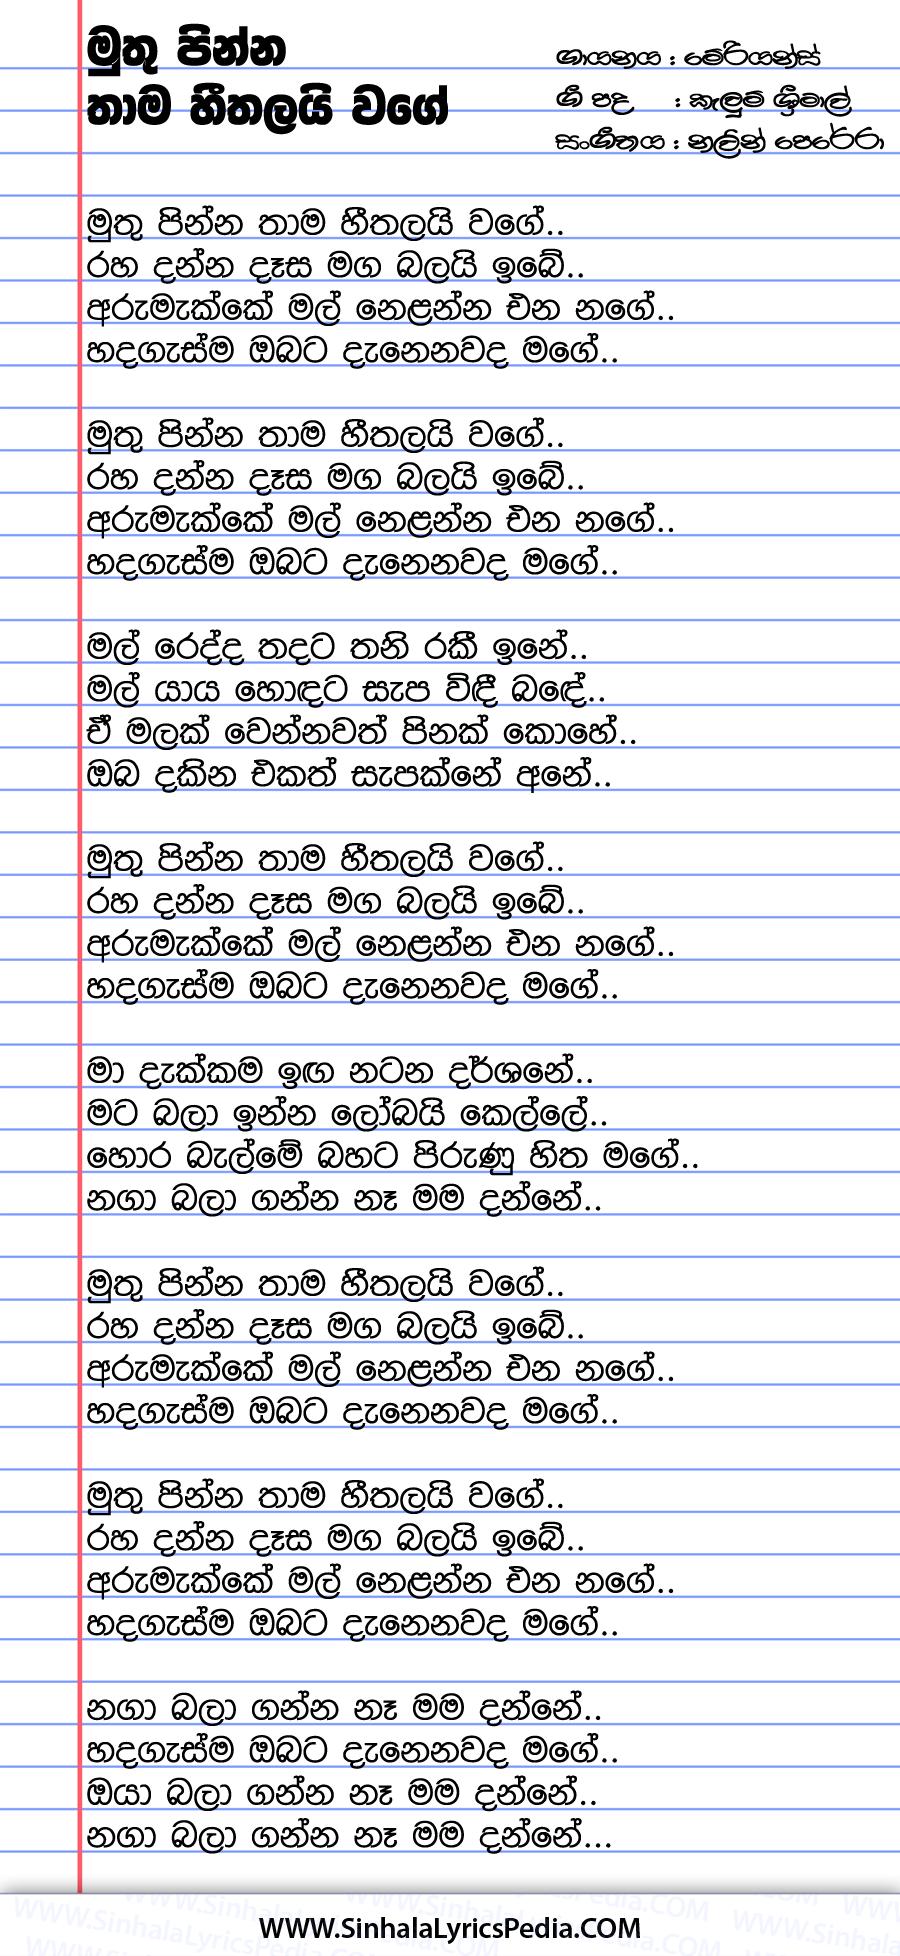 Muthu Pinna Thama Heethalai Song Lyrics